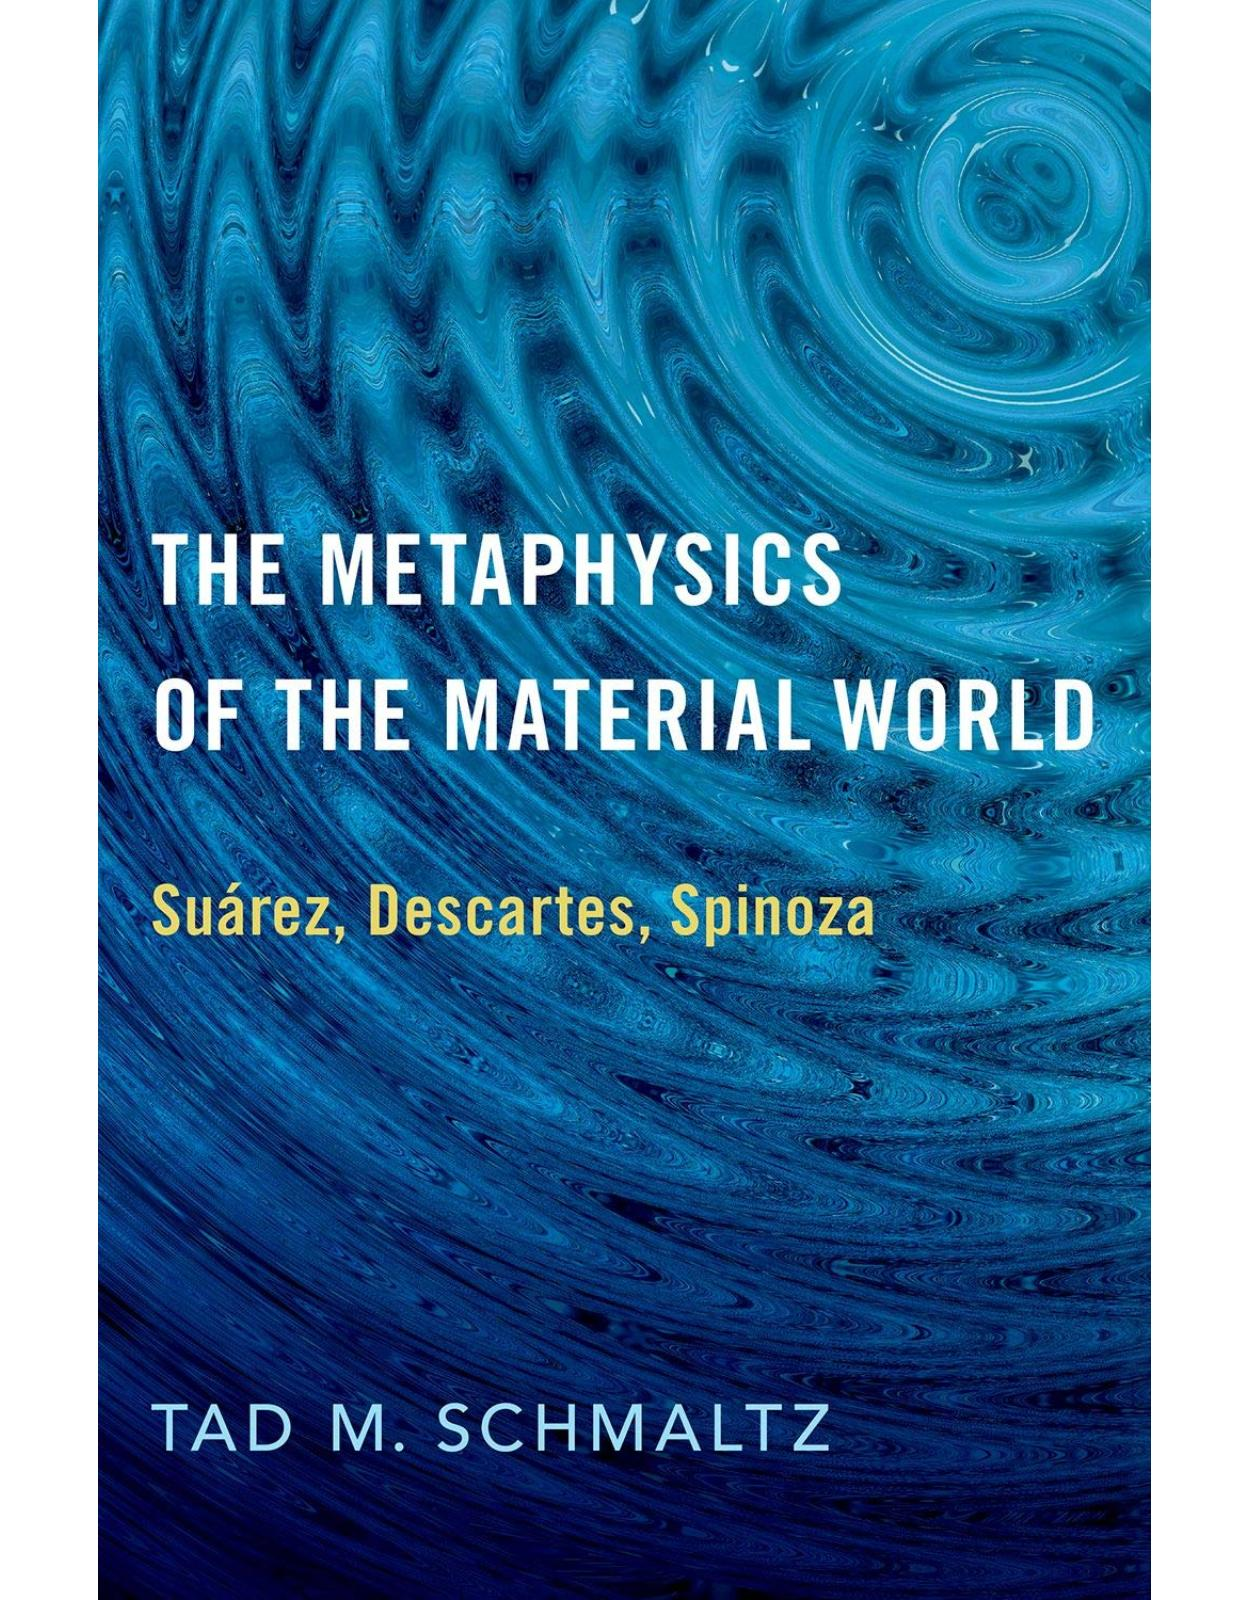 The Metaphysics of the Material World: Suárez, Descartes, Spinoza